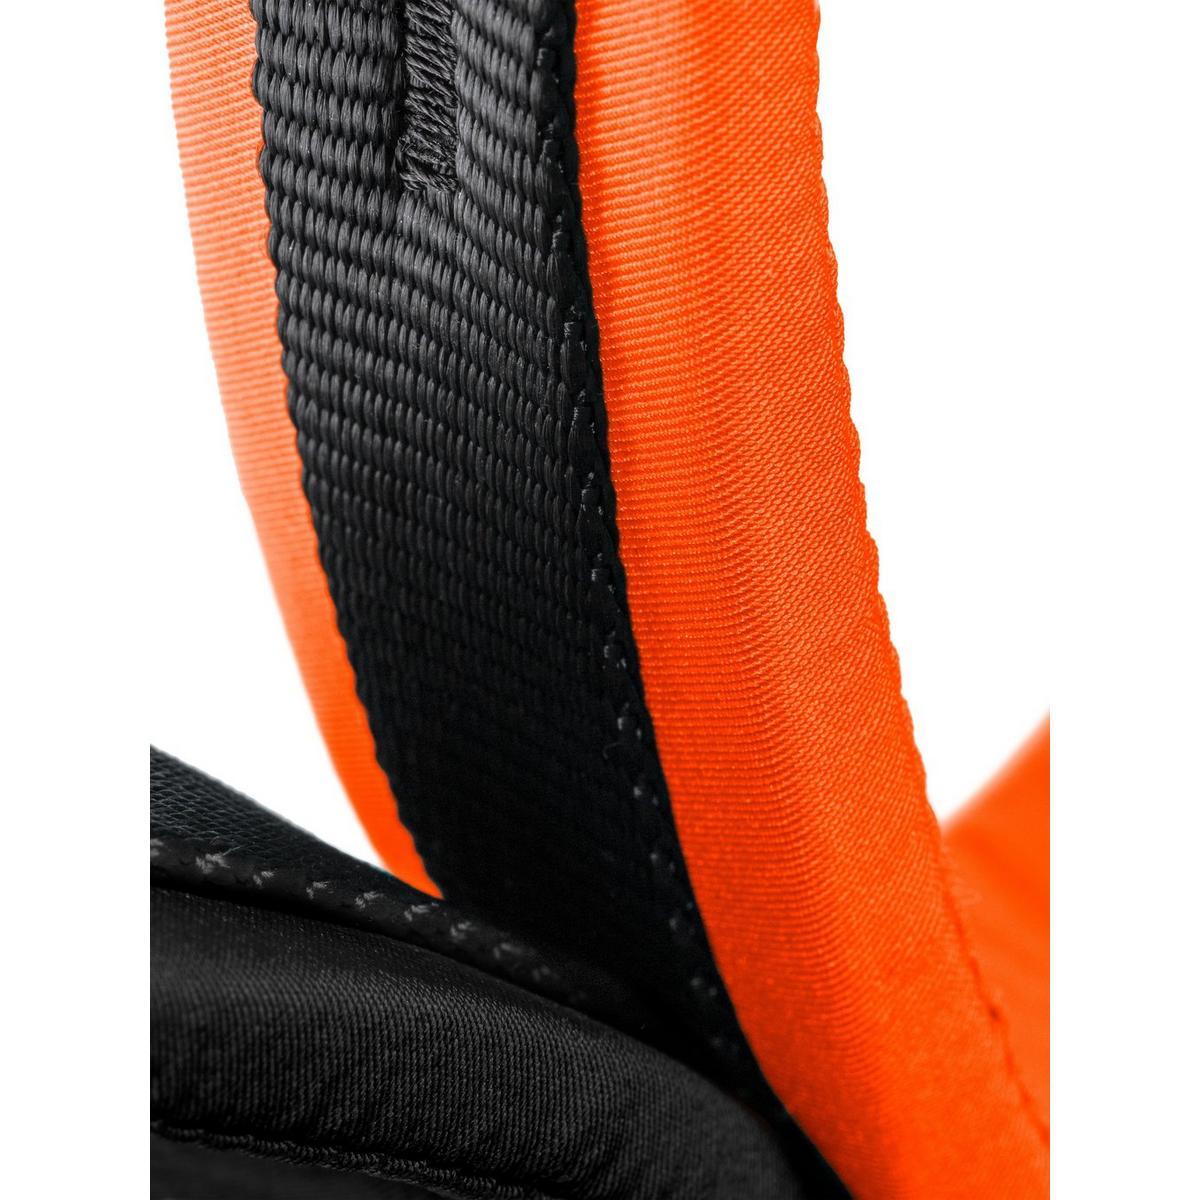 Mammut 4 Slide Harness - Black / Orange